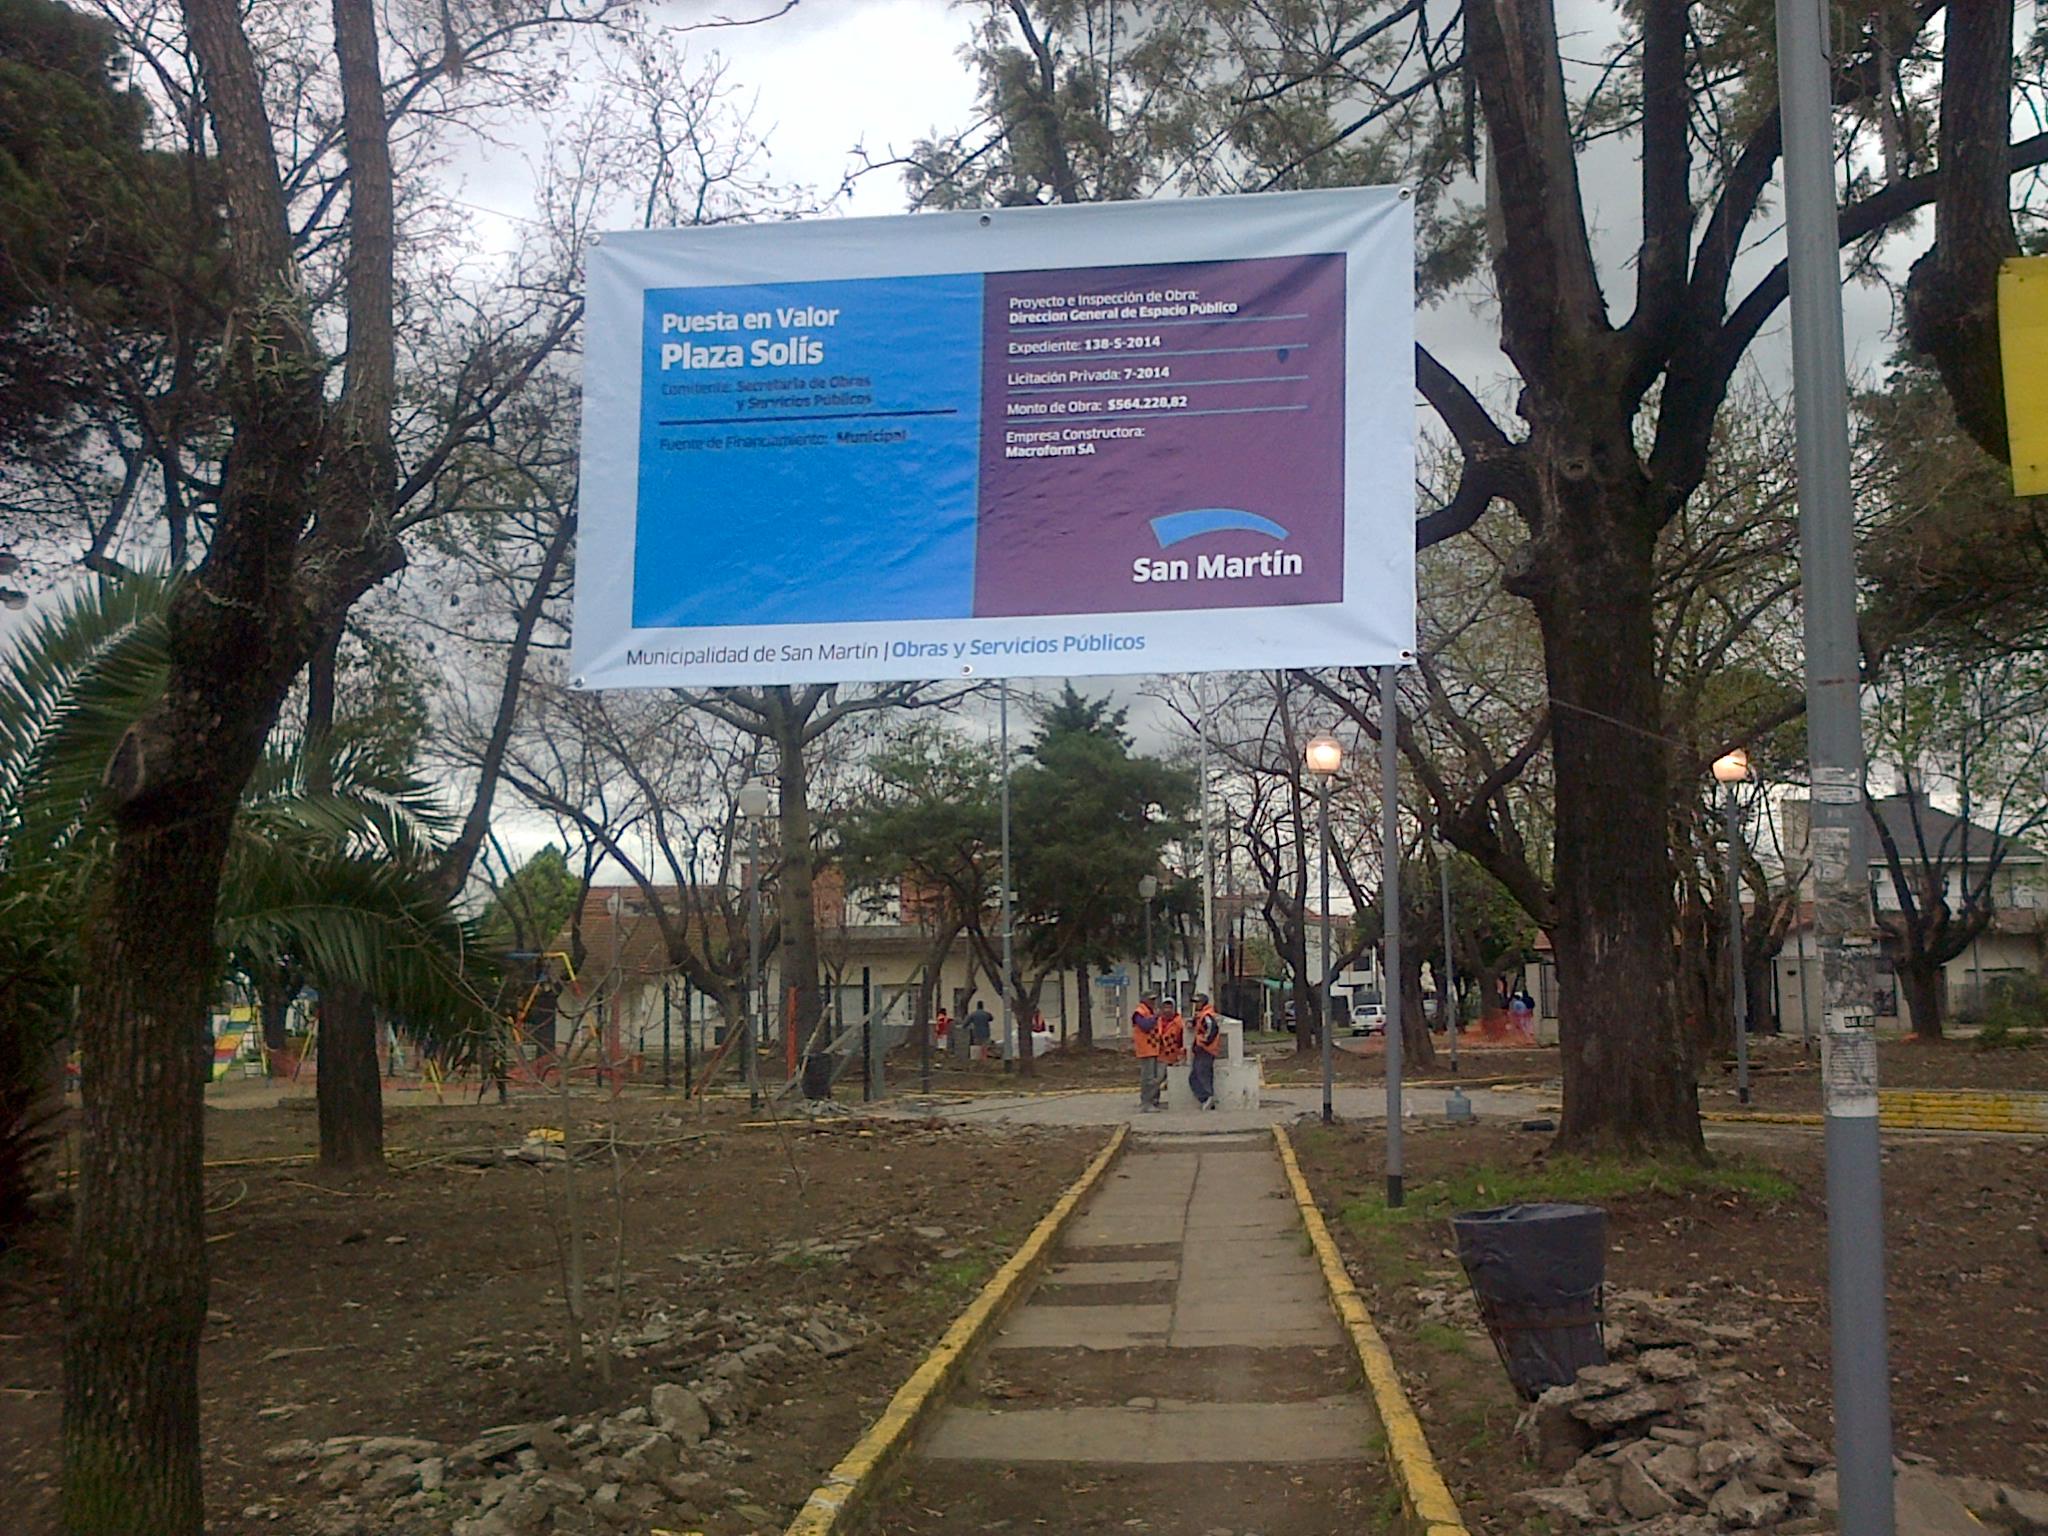 Obra Plaza Solis